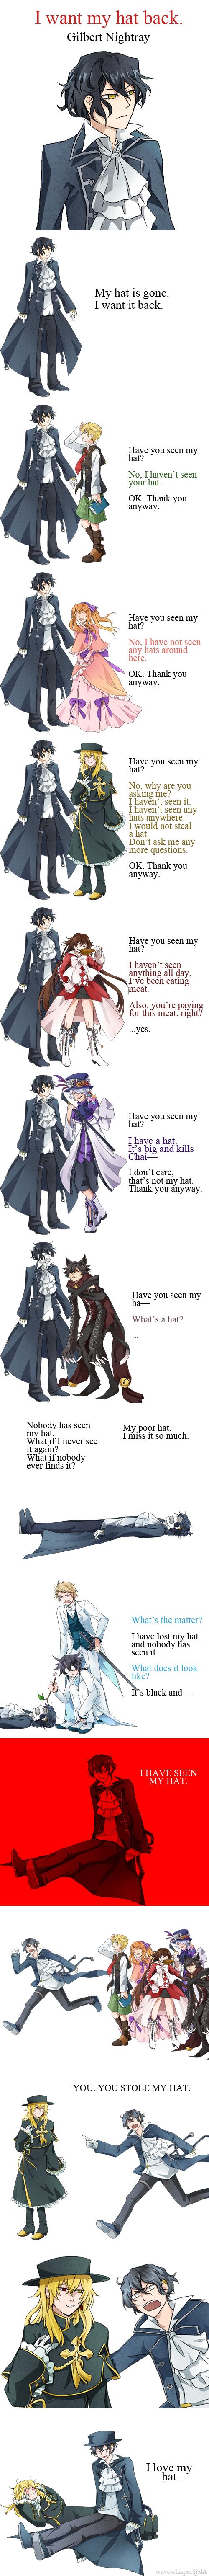 Tags: Anime, Wavewhisper, Pandora Hearts, Sharon Rainsworth, Cheshire Cat (Pandora Hearts), Xerxes Break, Oz Vessalius, Leo Baskerville, Gilbert Nightray, Elliot Nightray, Alice Baskerville, Vincent Nightray, Tailcoat